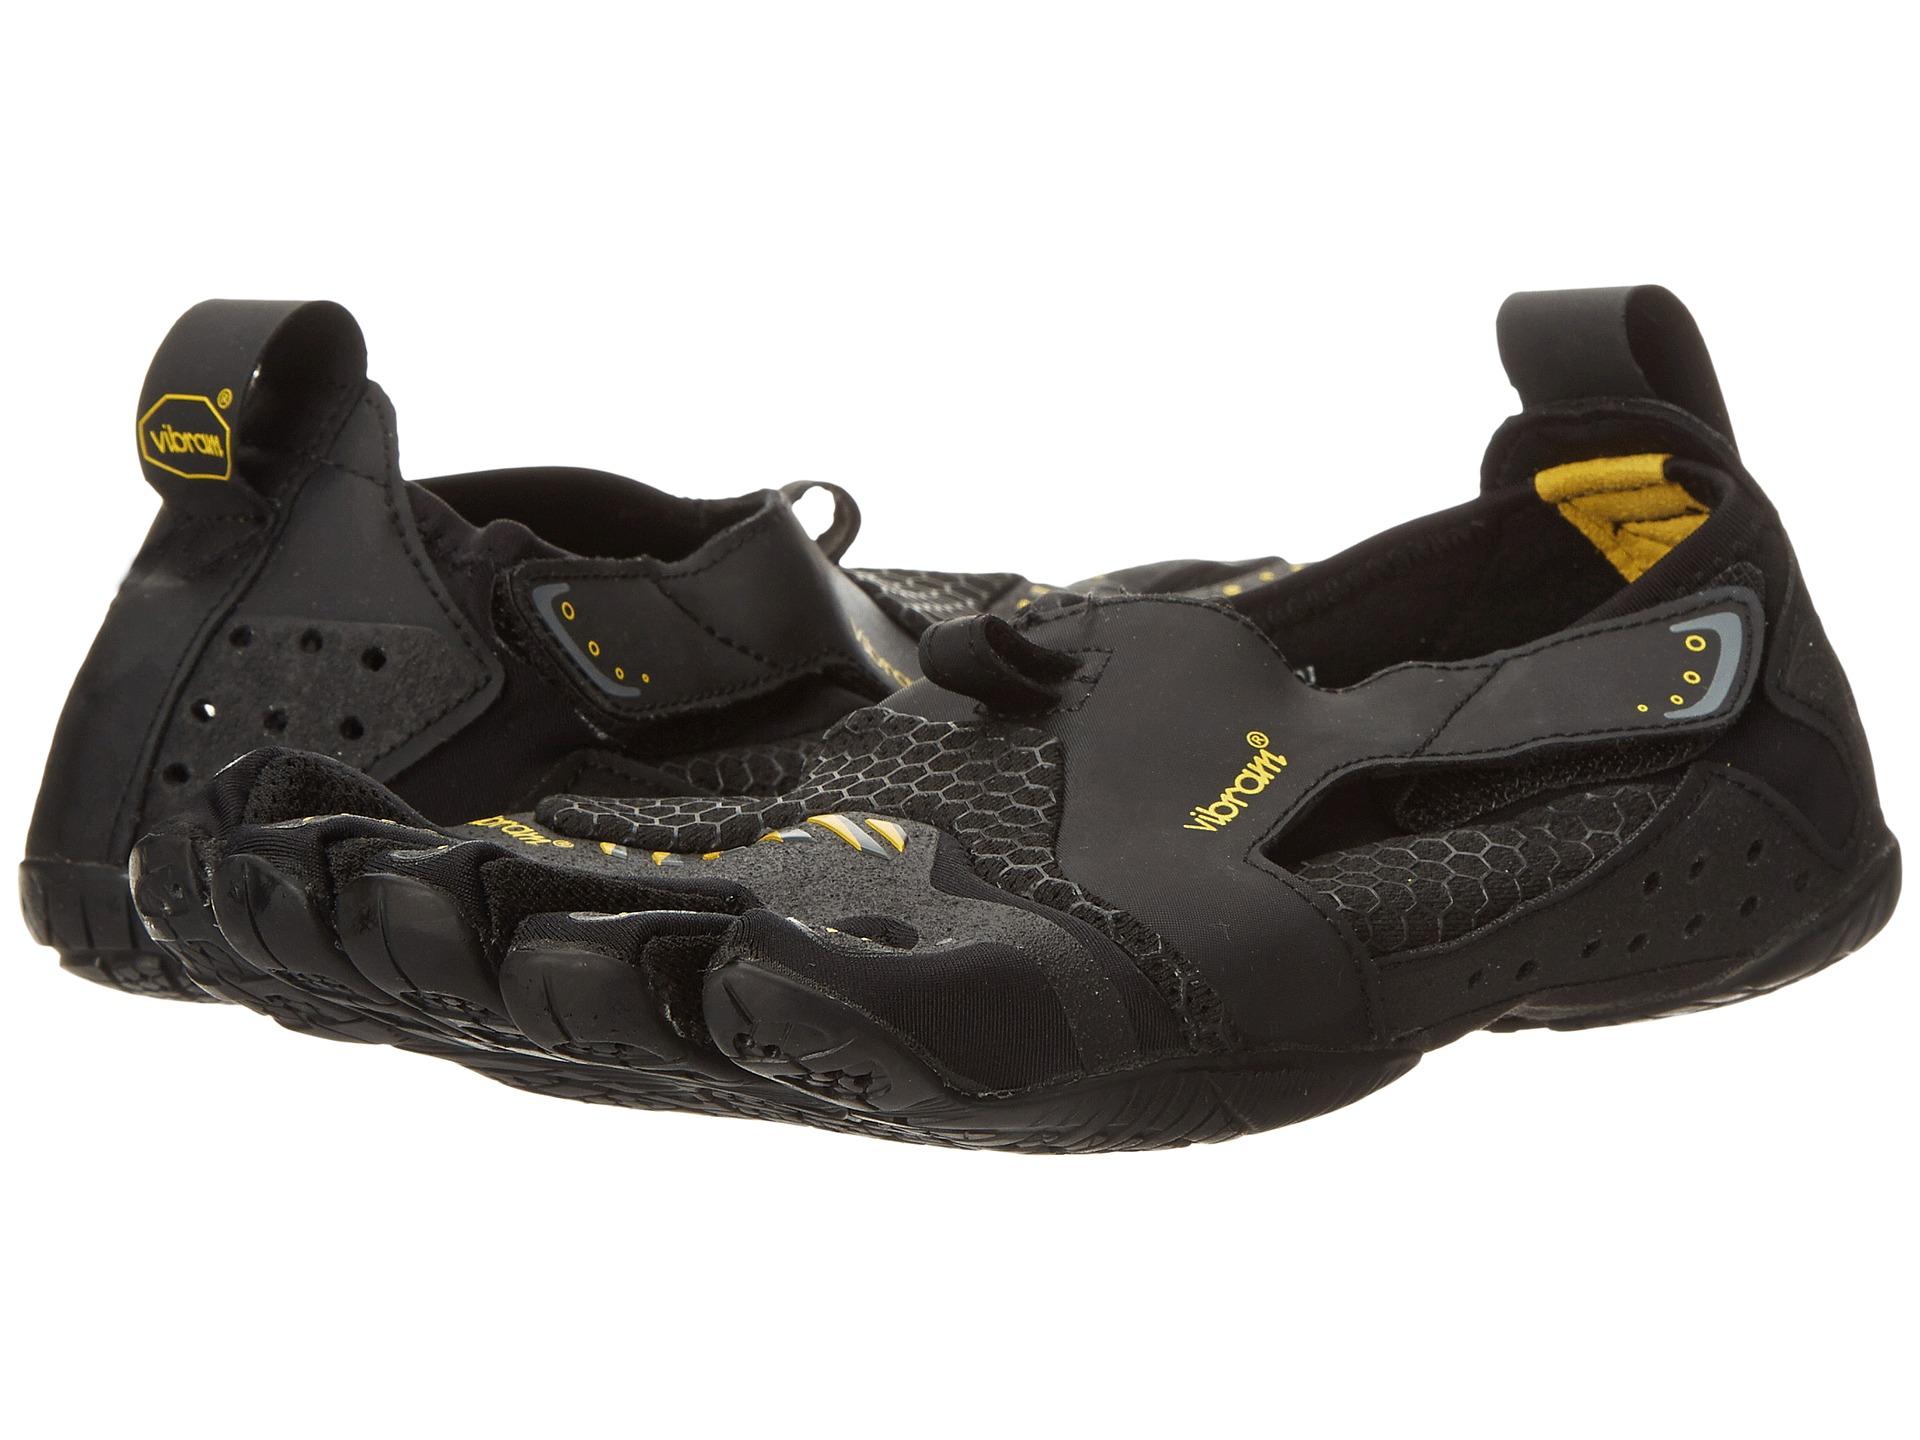 vibram five fingers maiori water shoes